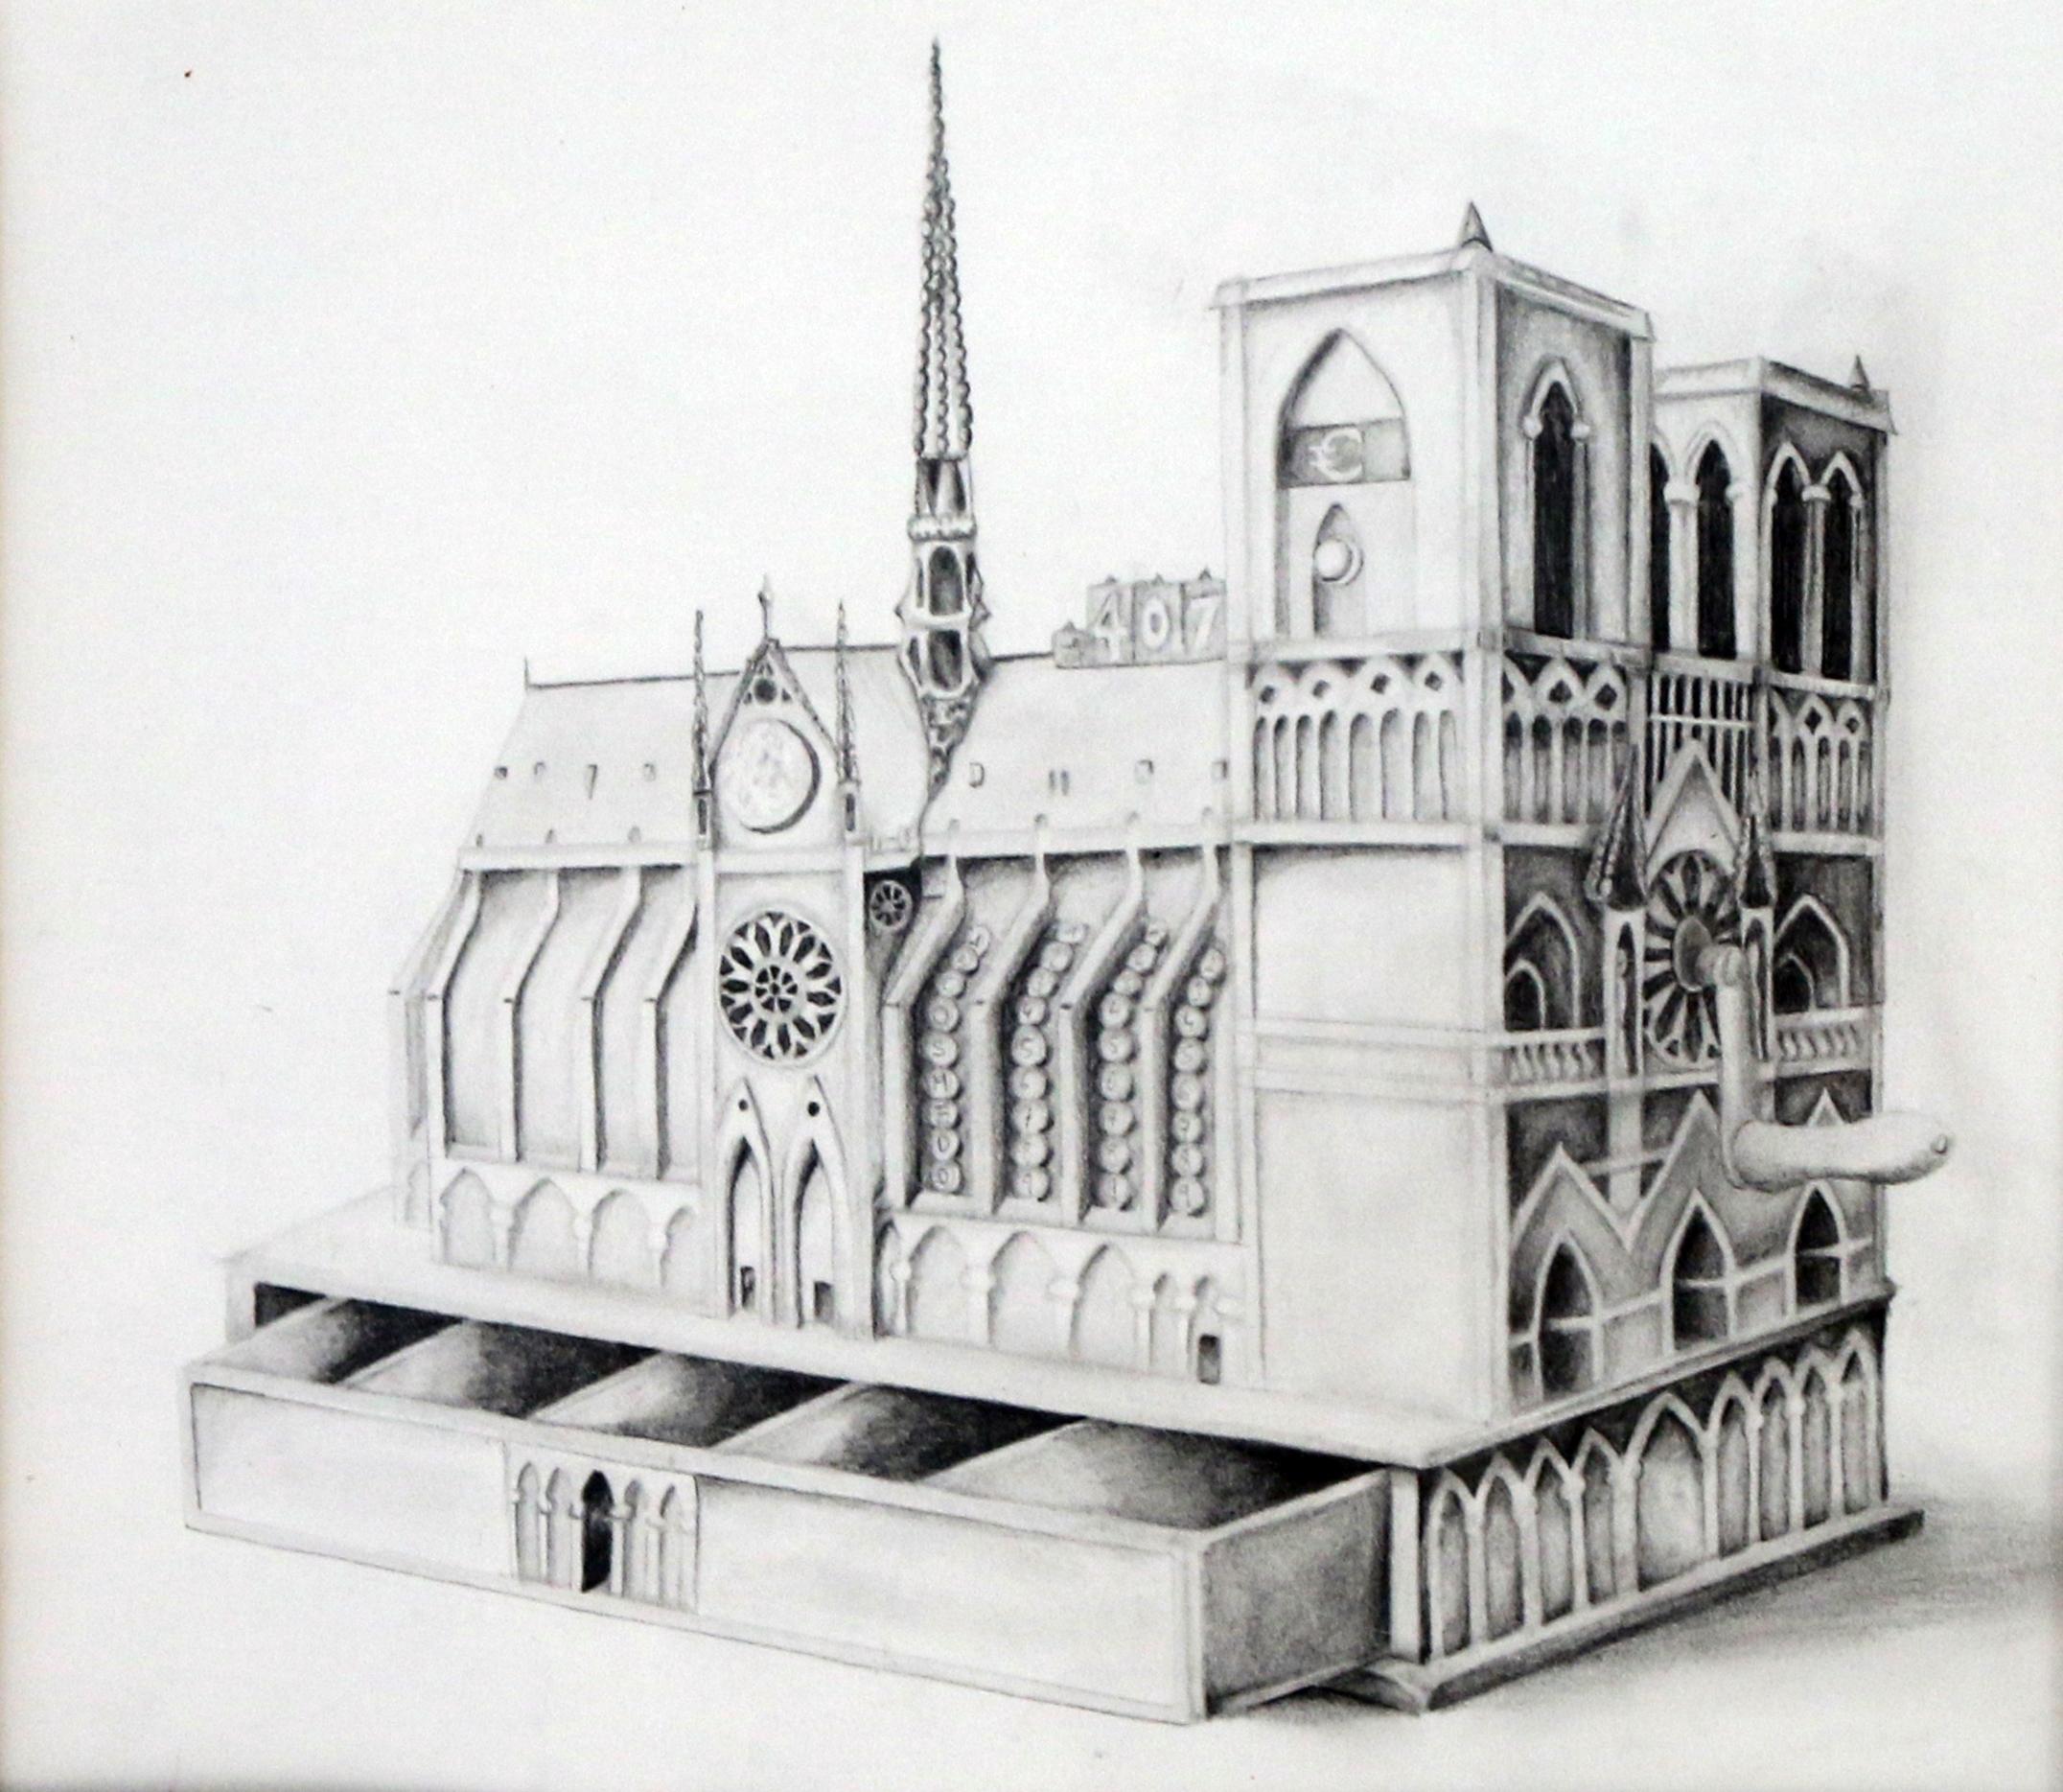 Registrierkasse Notre Dame